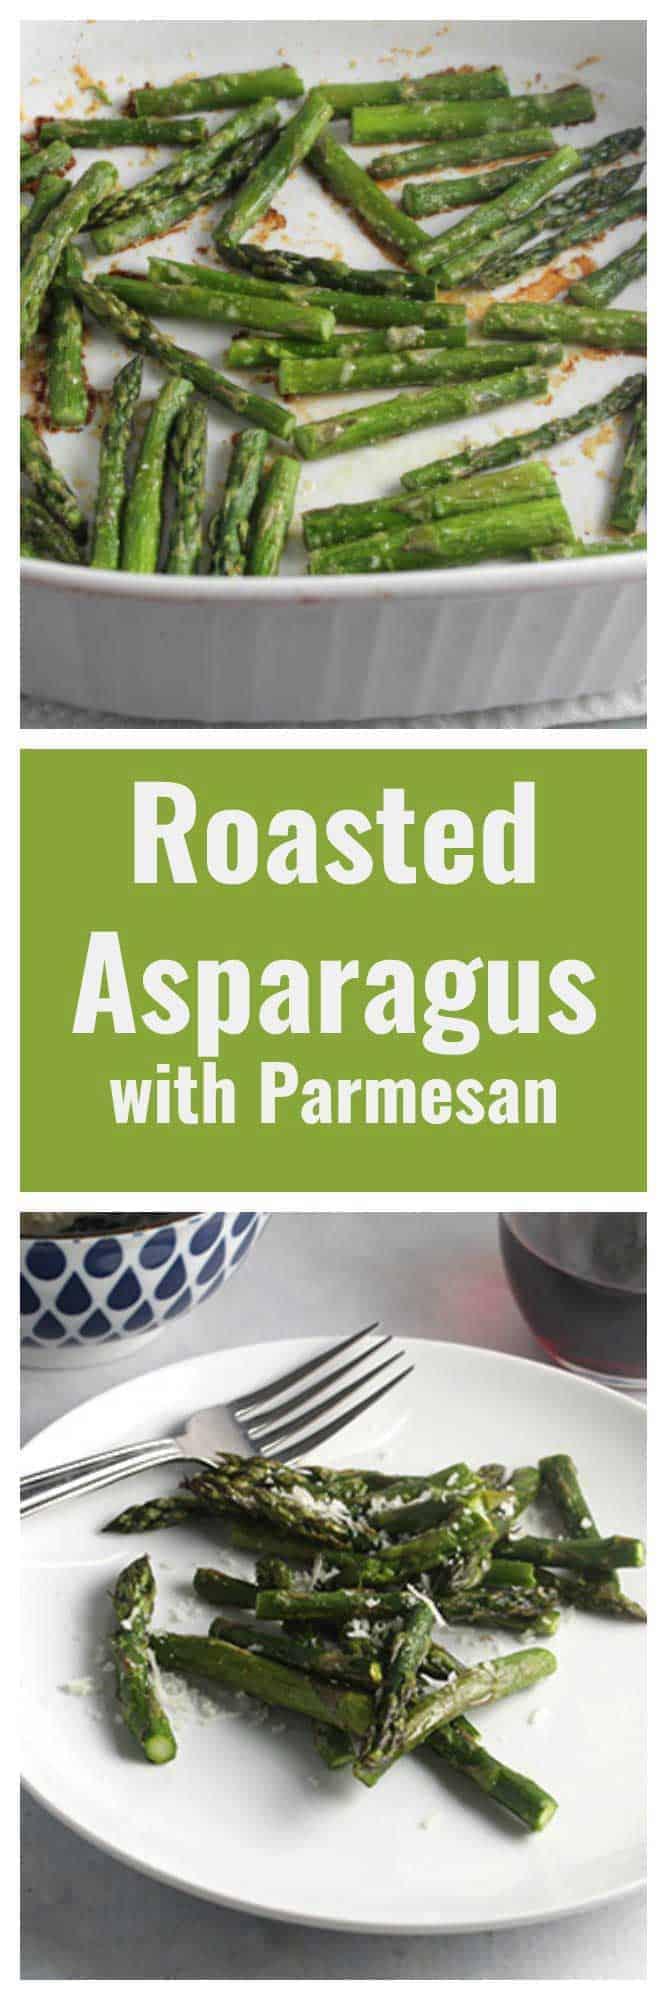 Roasted Asparagus with Parmesanrecipe is an easy and tasty spring side dish. #SundaySupper #asparagus #roastedveggies #sidedish